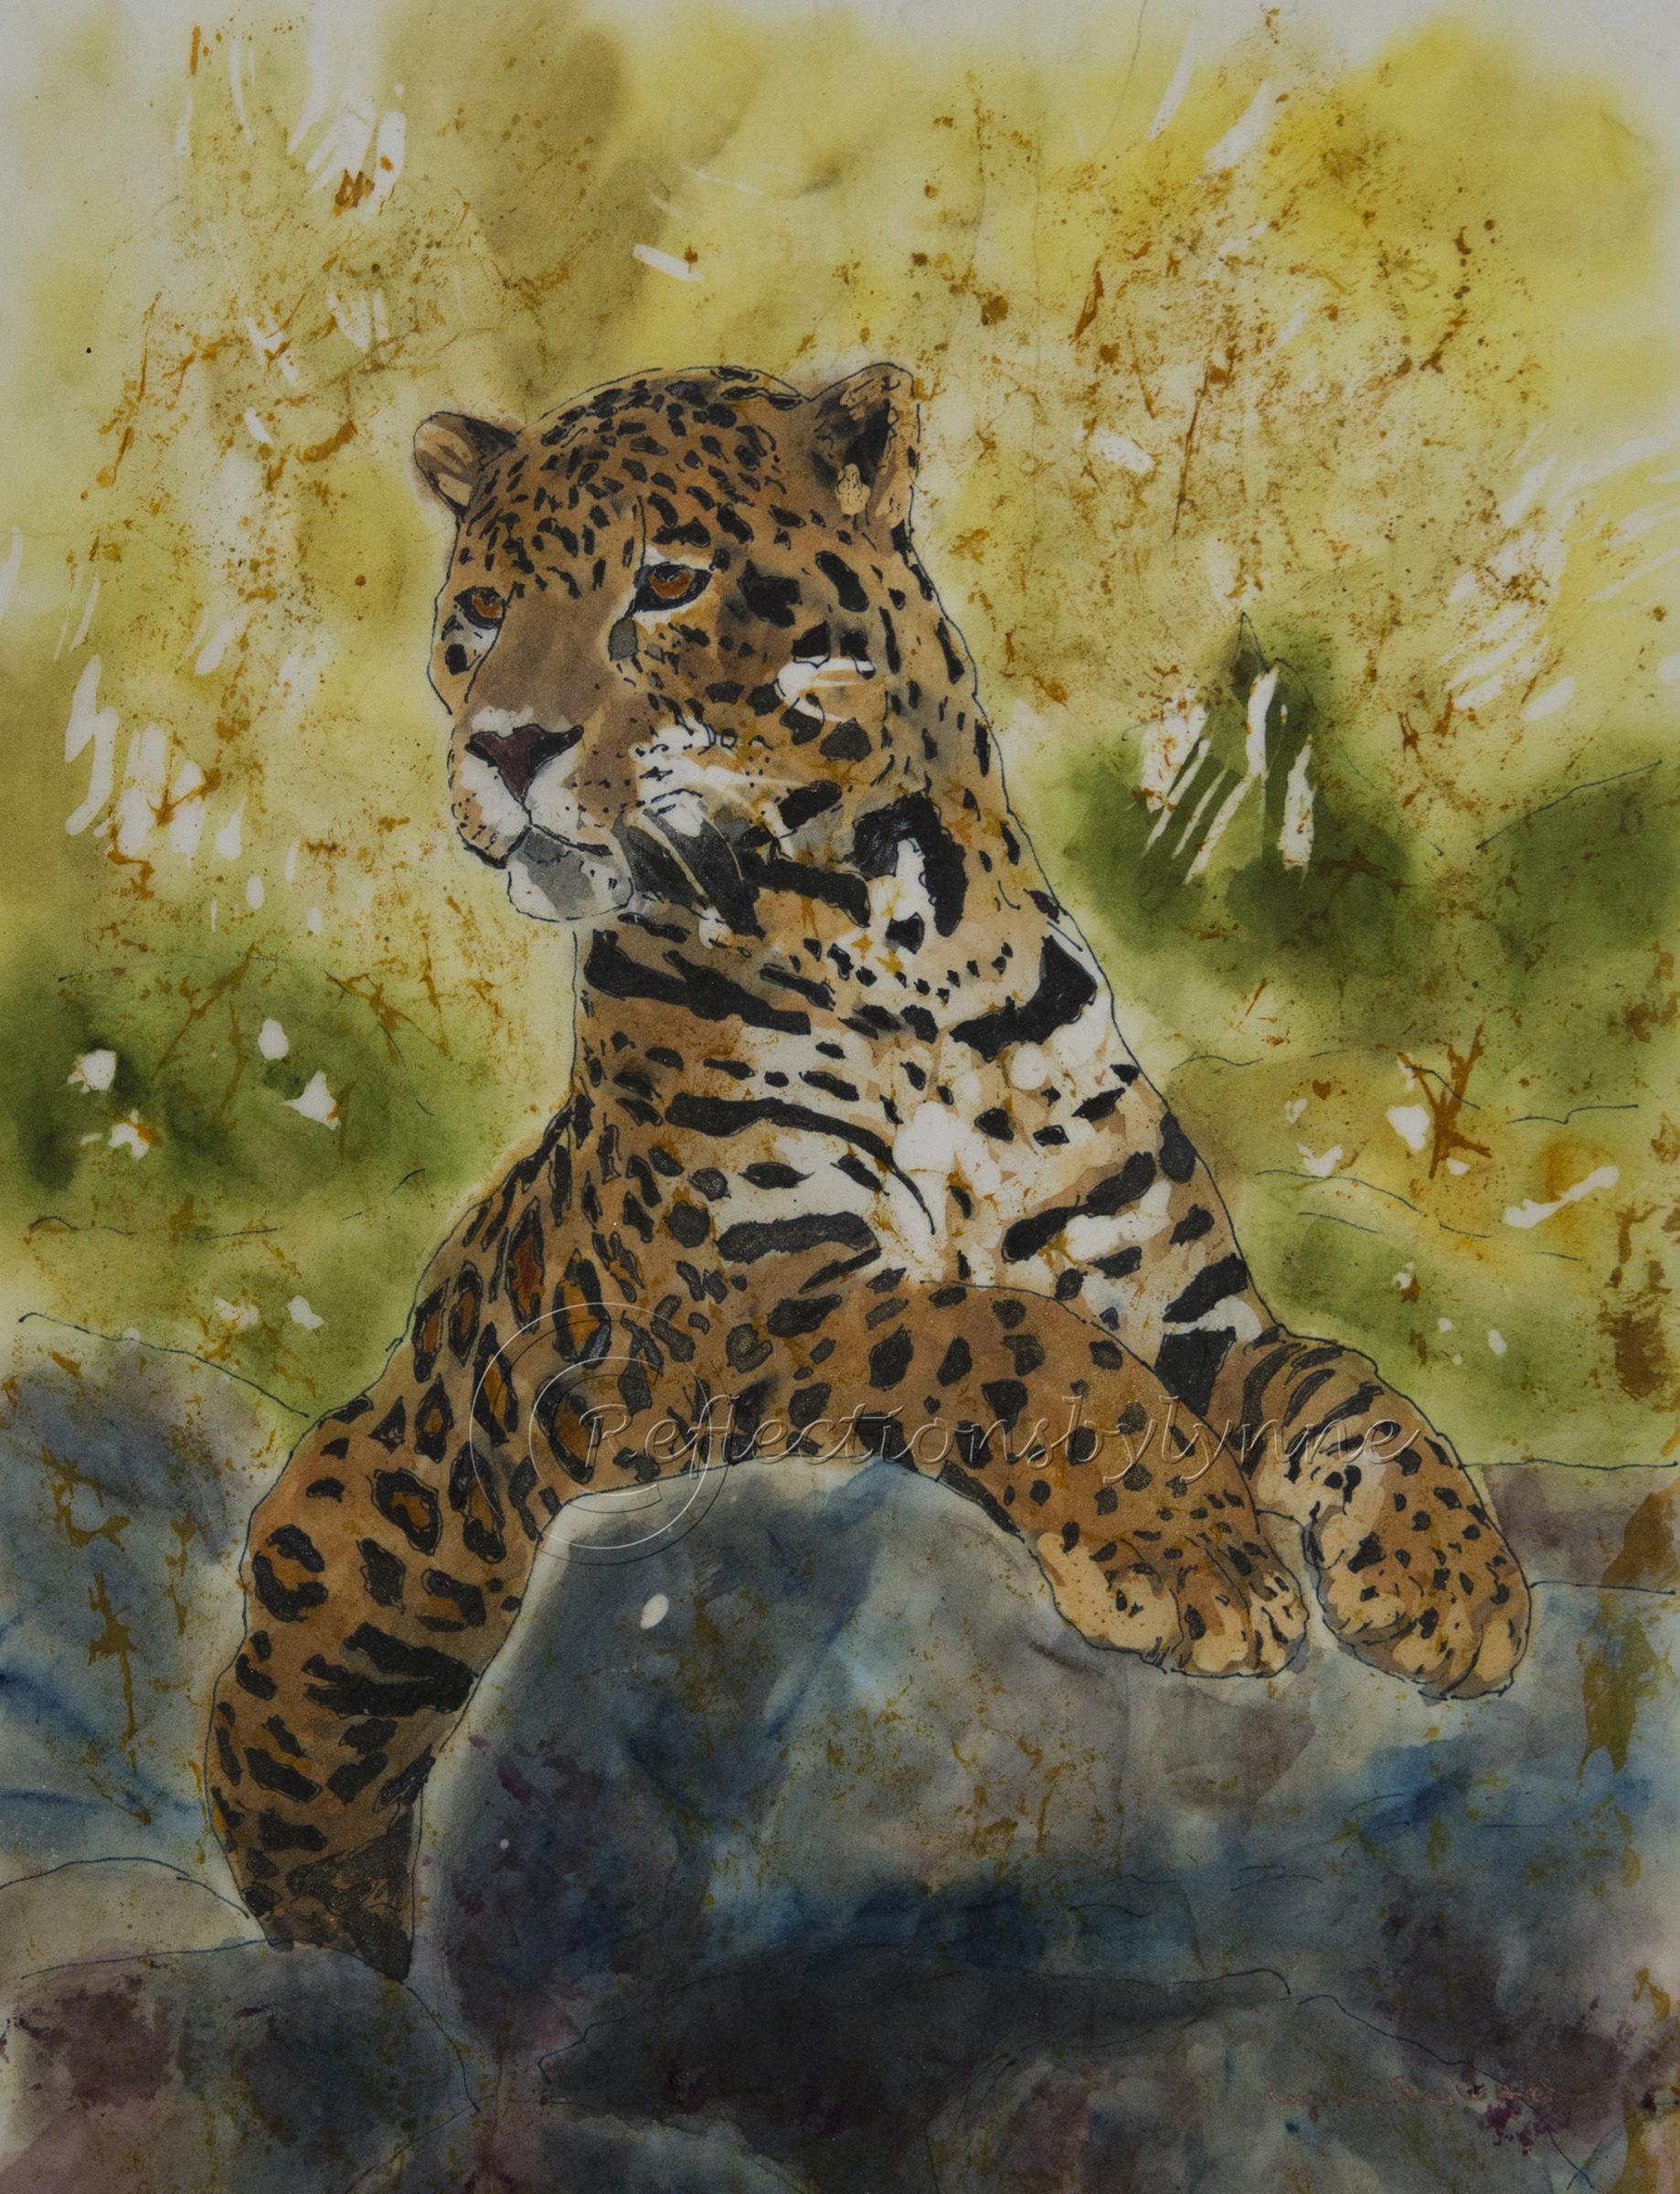 Edwards_Jaguar Beauty.jpg